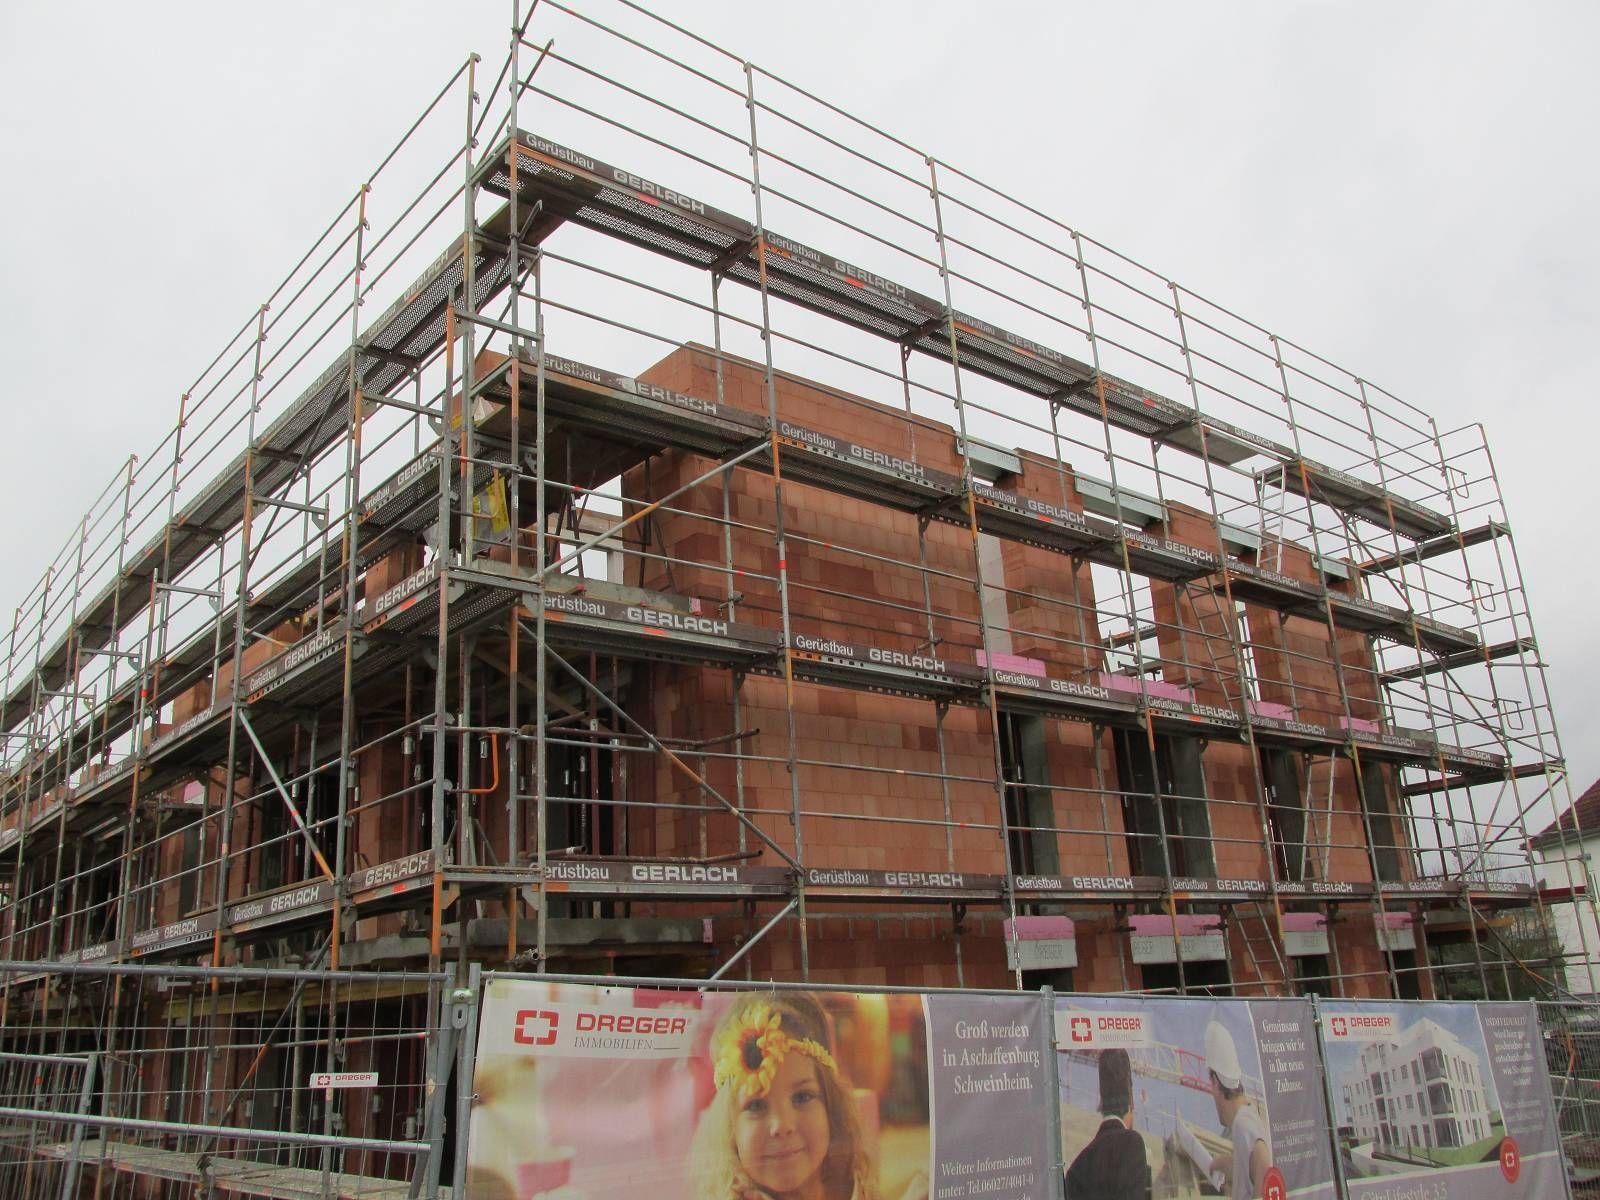 Bautenstand 28.01.2015 Aschaffenburg, Baubeginn, Bau